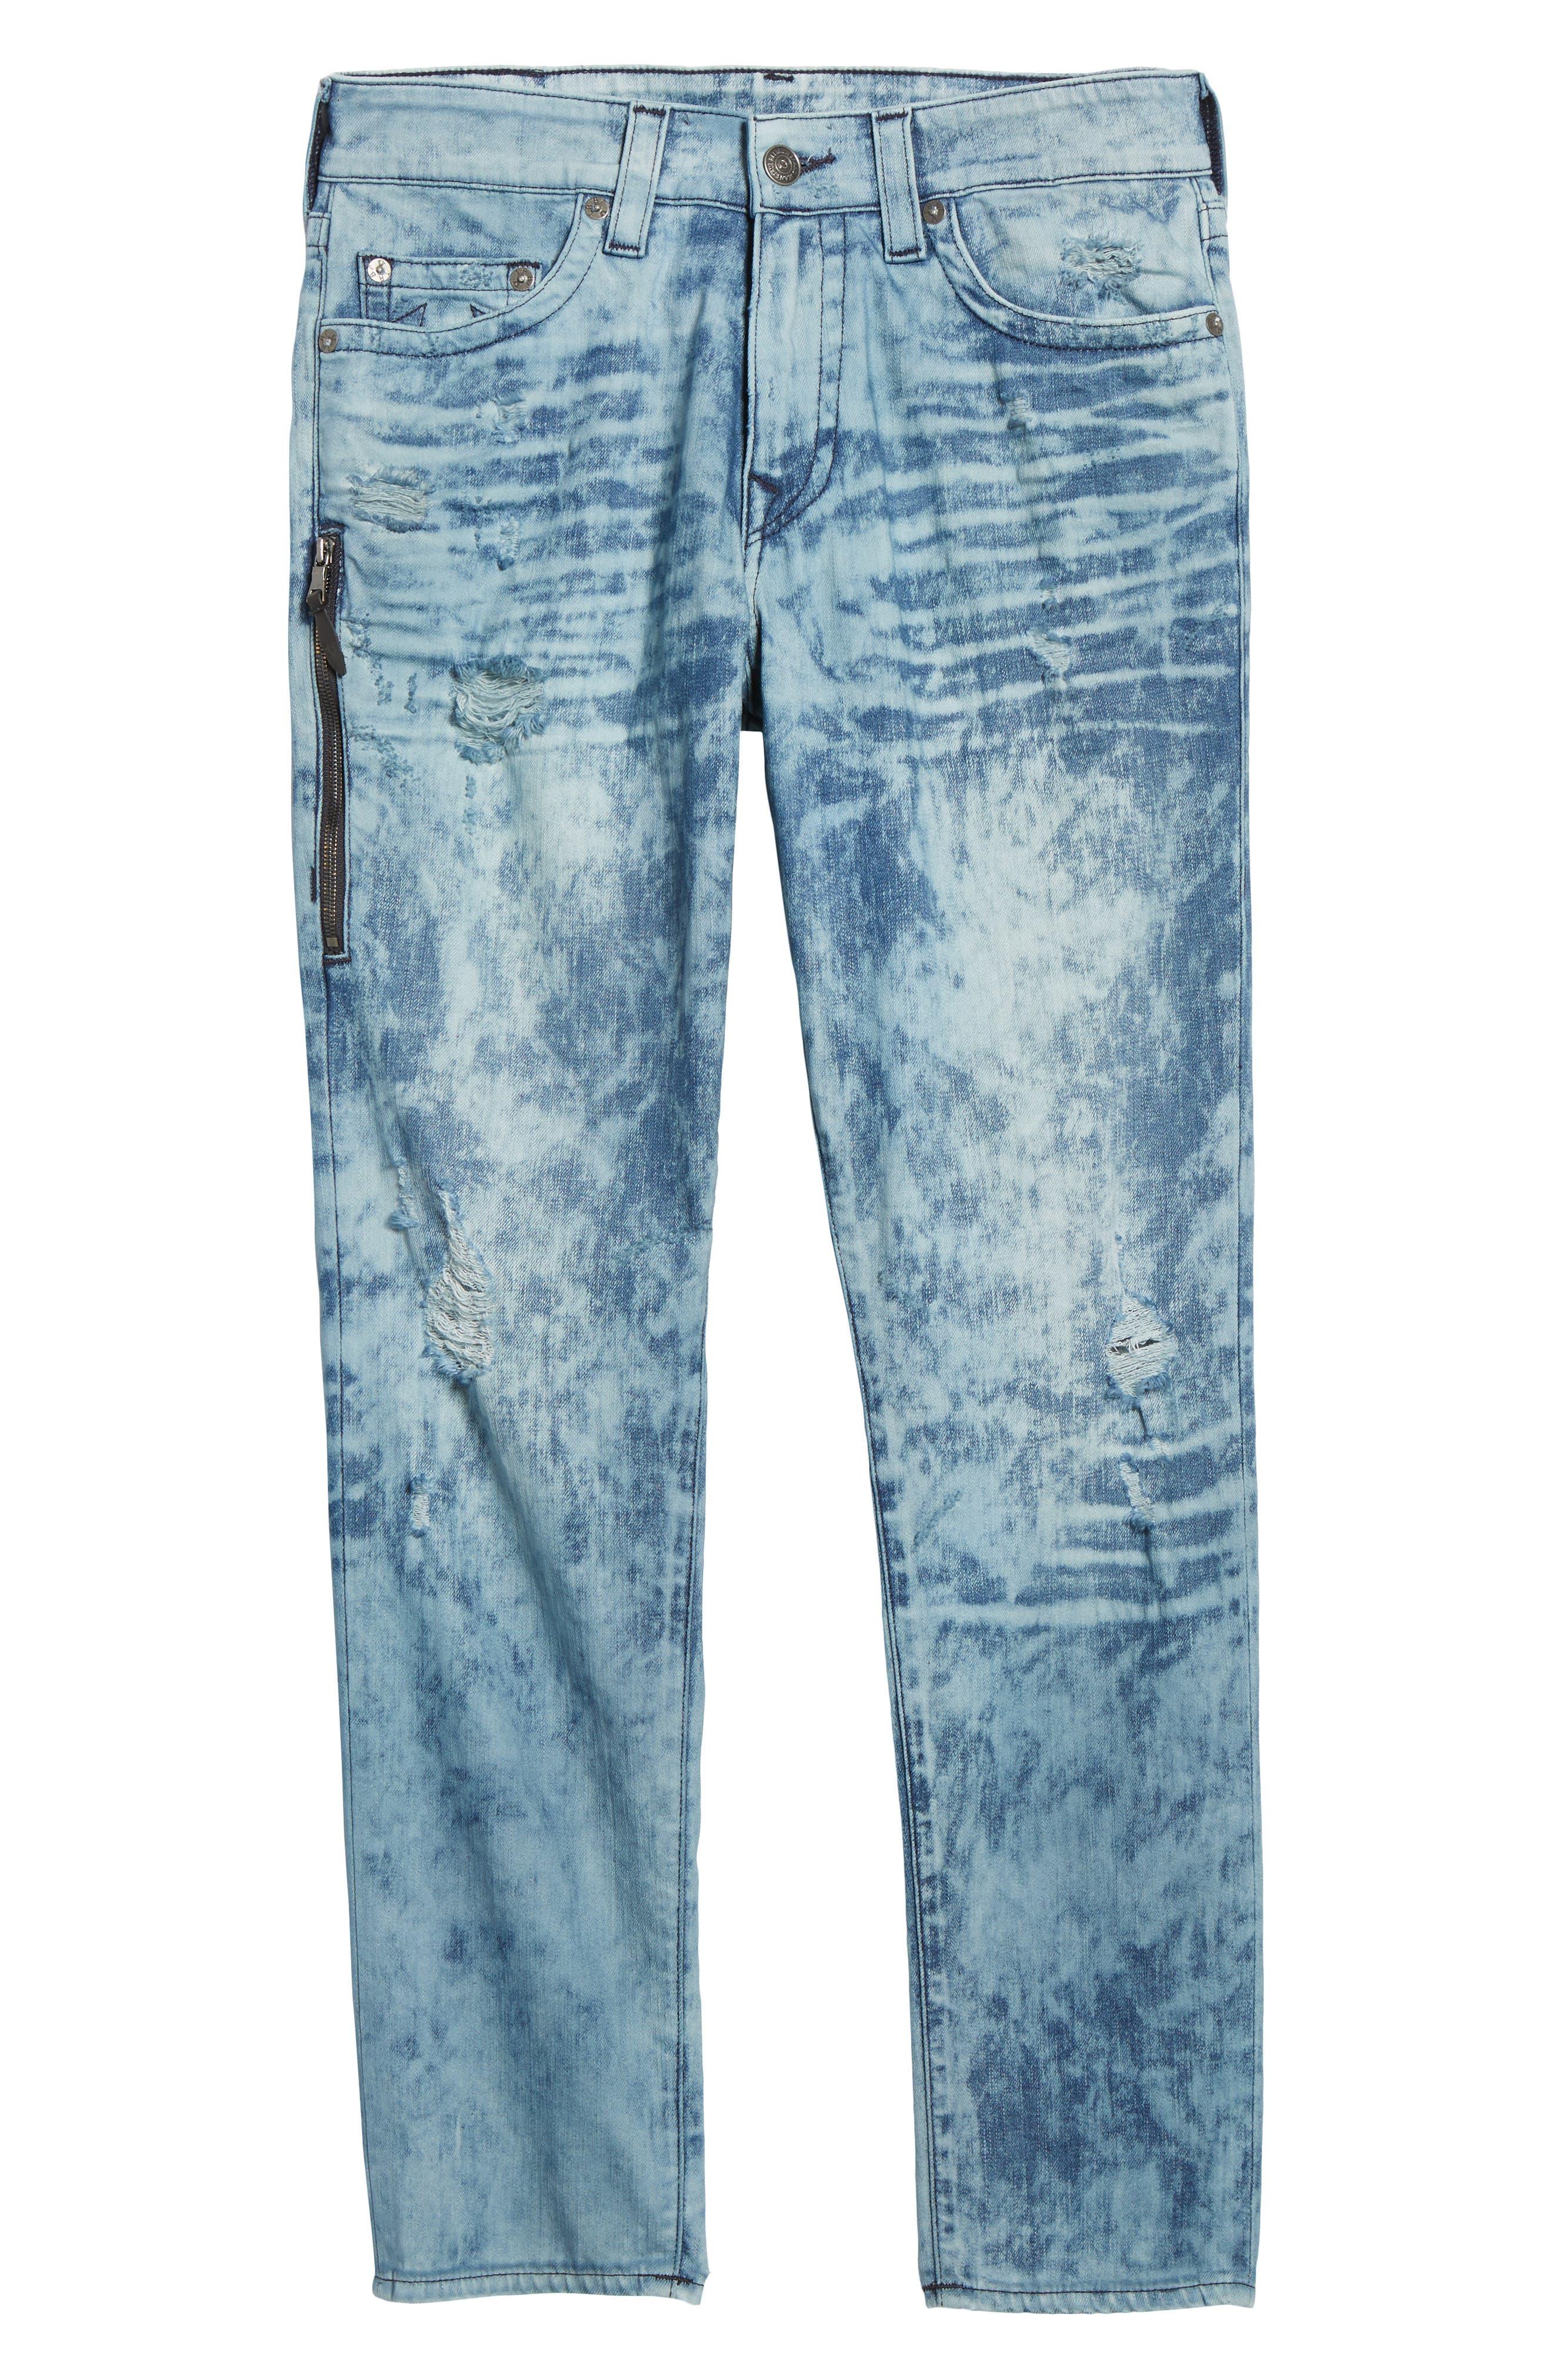 Mick Skinny Fit Jeans,                             Alternate thumbnail 6, color,                             401